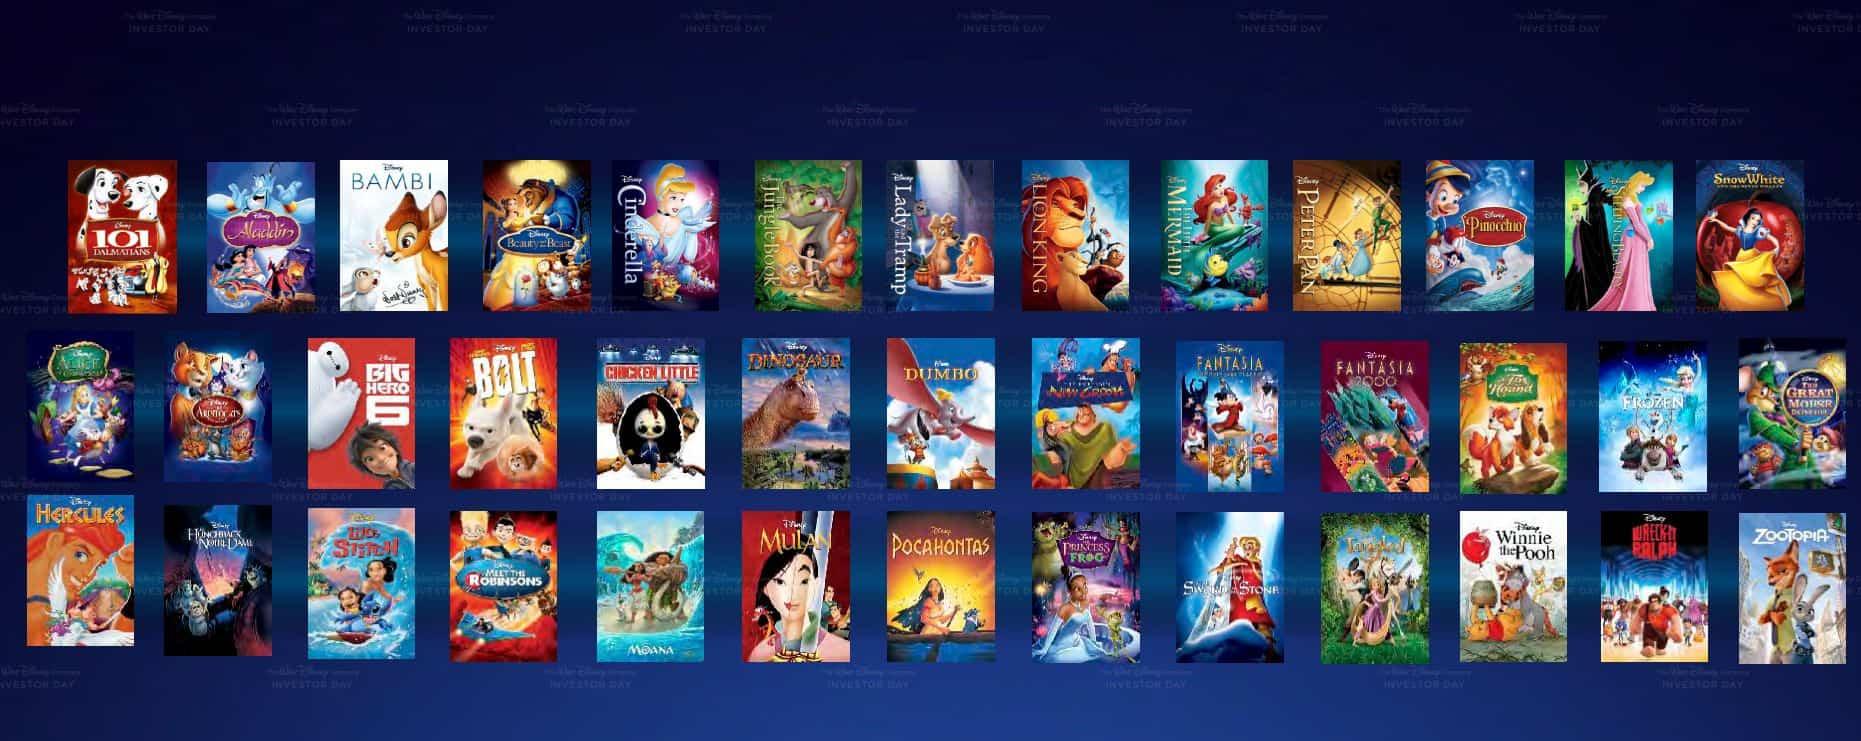 Disney Plus - Animation